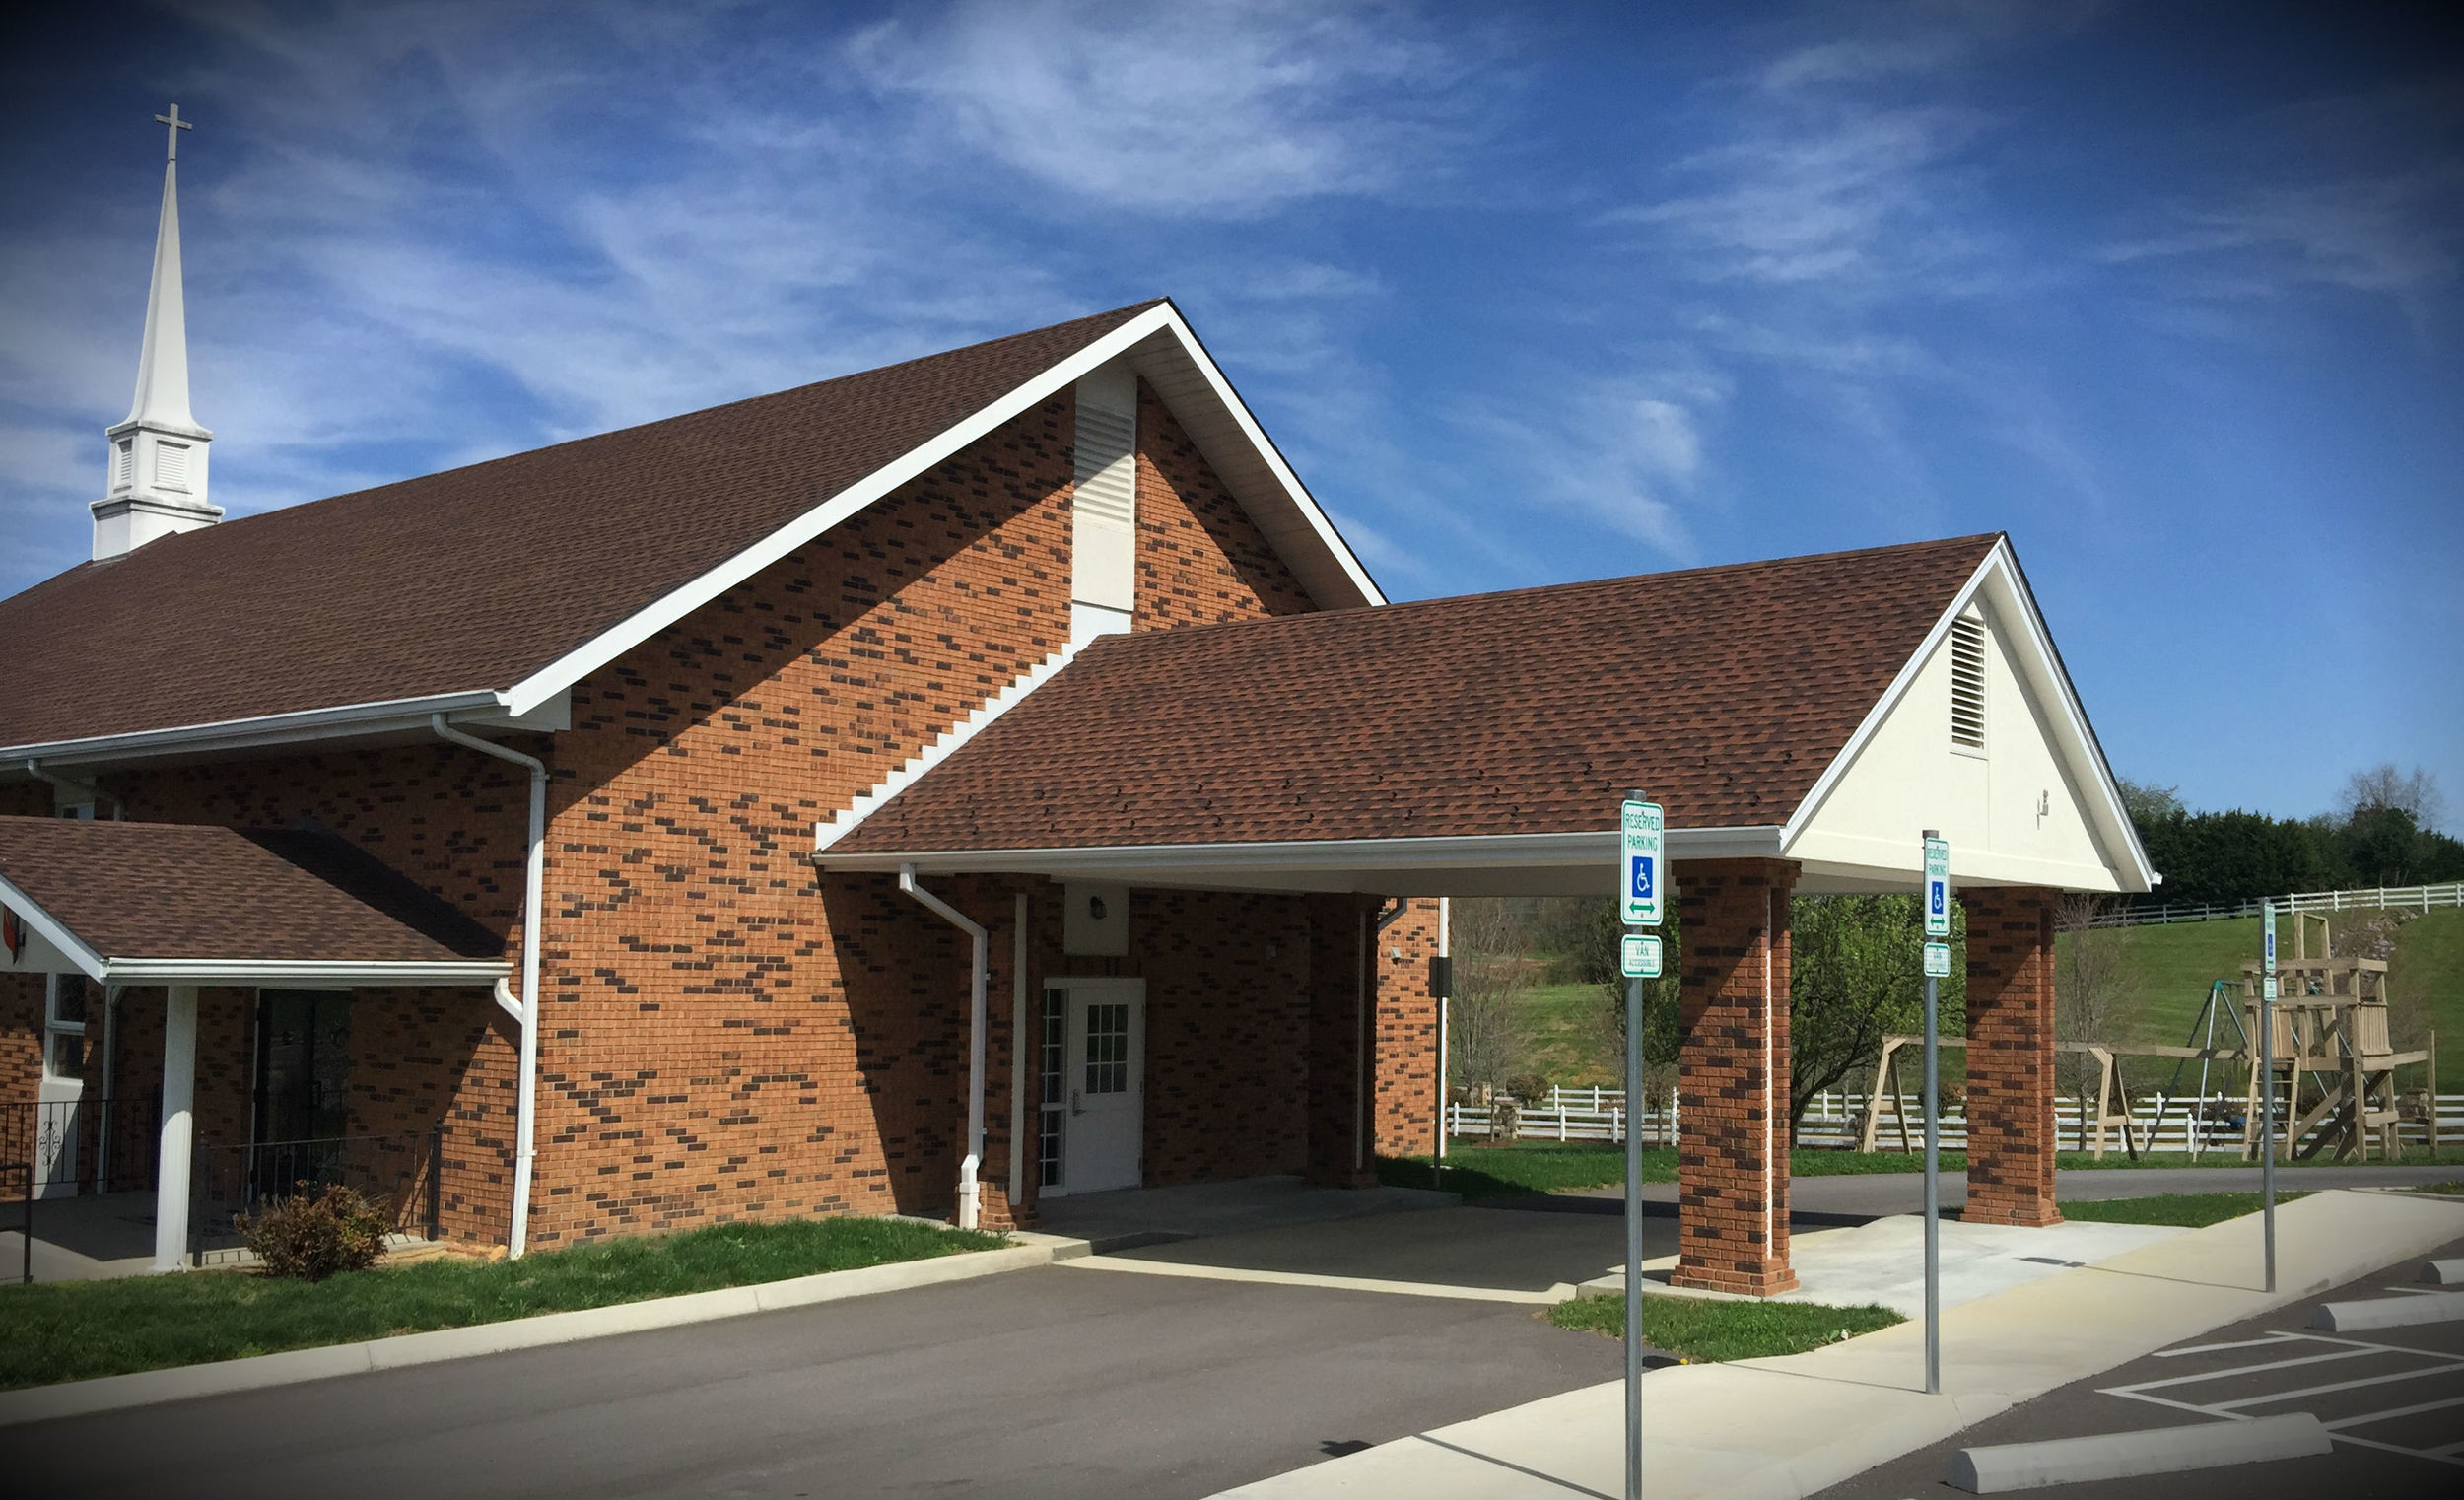 Marvin's Chapel Methodist Church